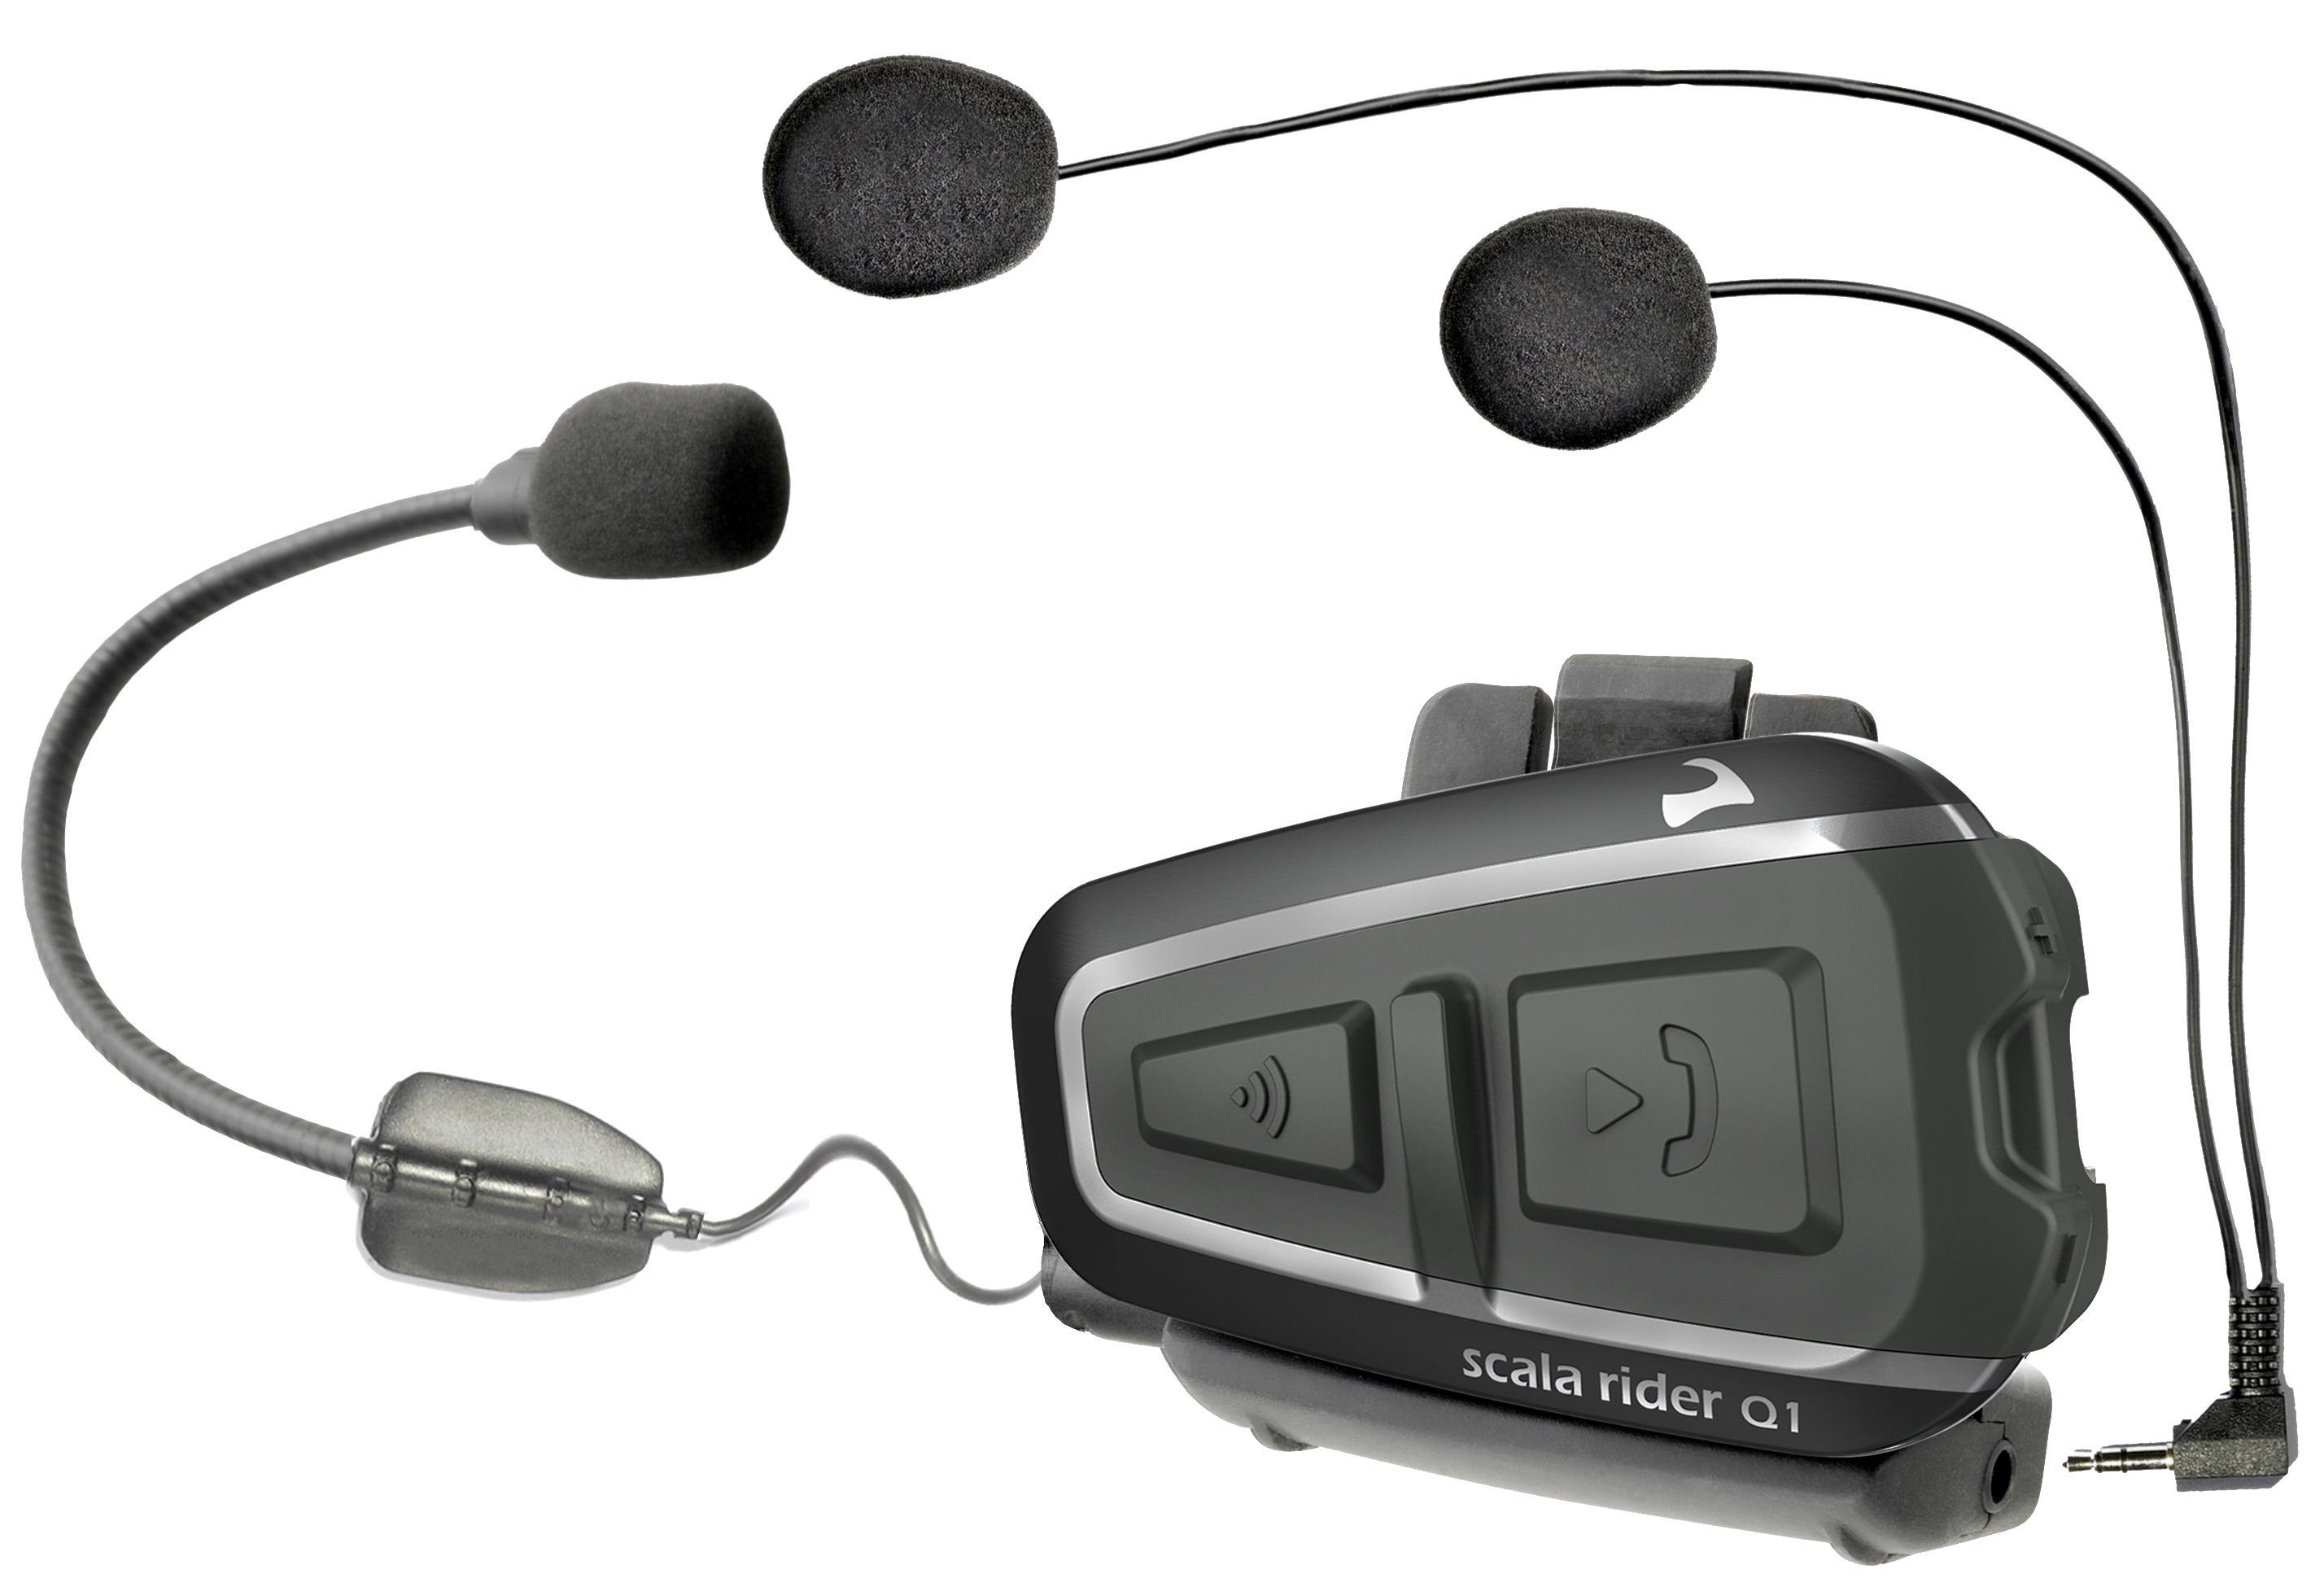 scala rider q1 bluetooth wireless communication system headset ebay. Black Bedroom Furniture Sets. Home Design Ideas